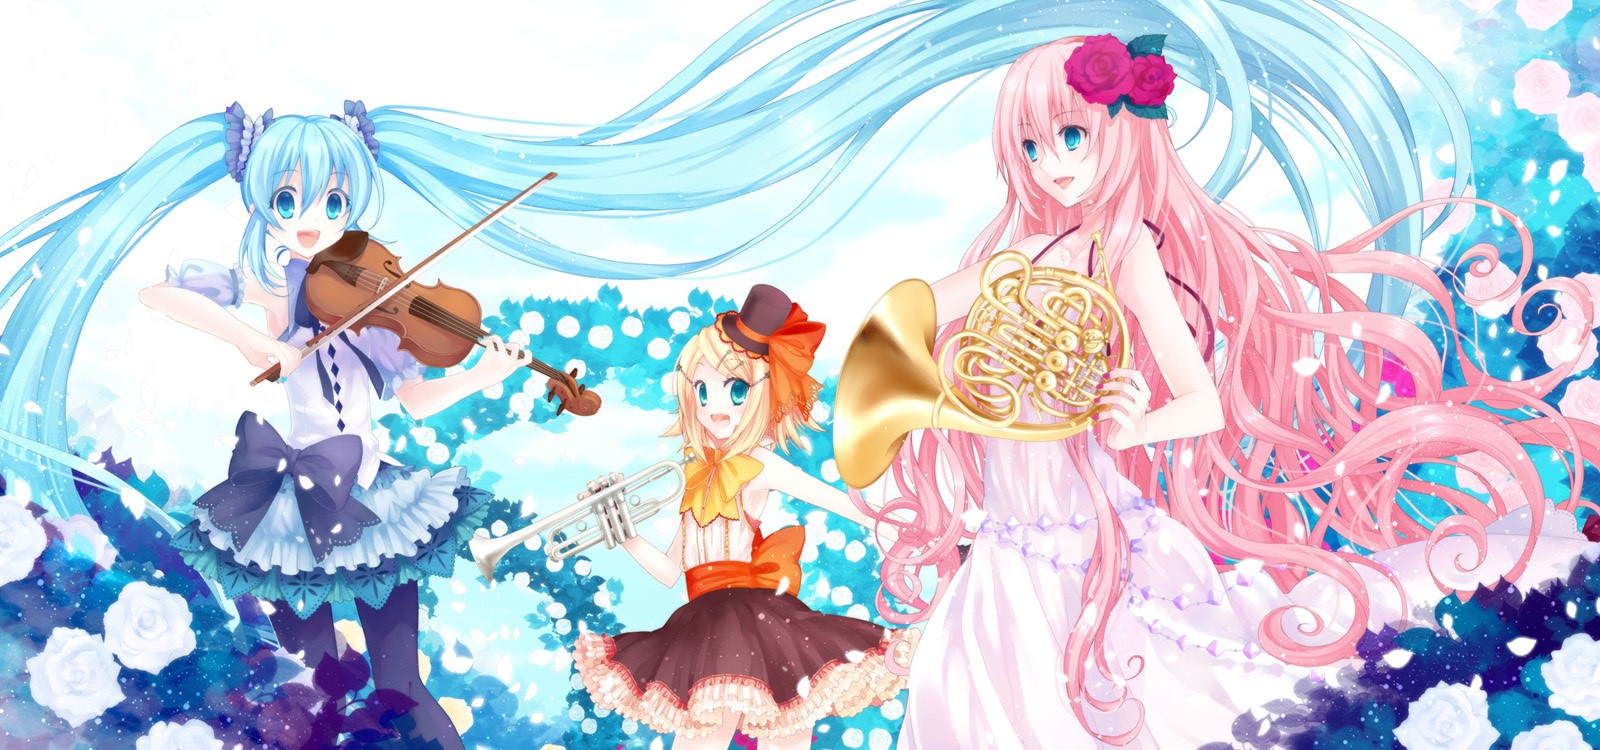 kawaii anime wallpaper wallpapersafari